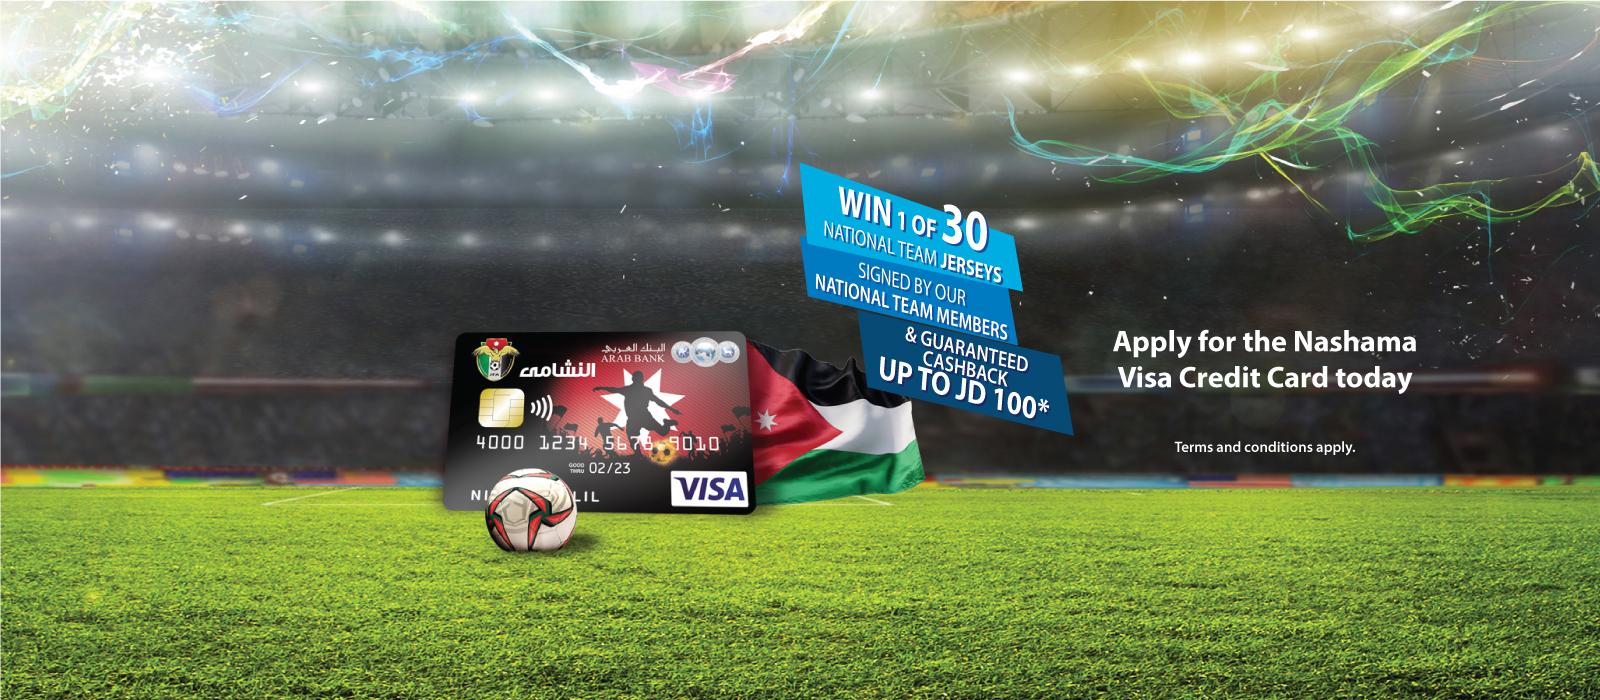 Nshama Visa Credit Card main banner